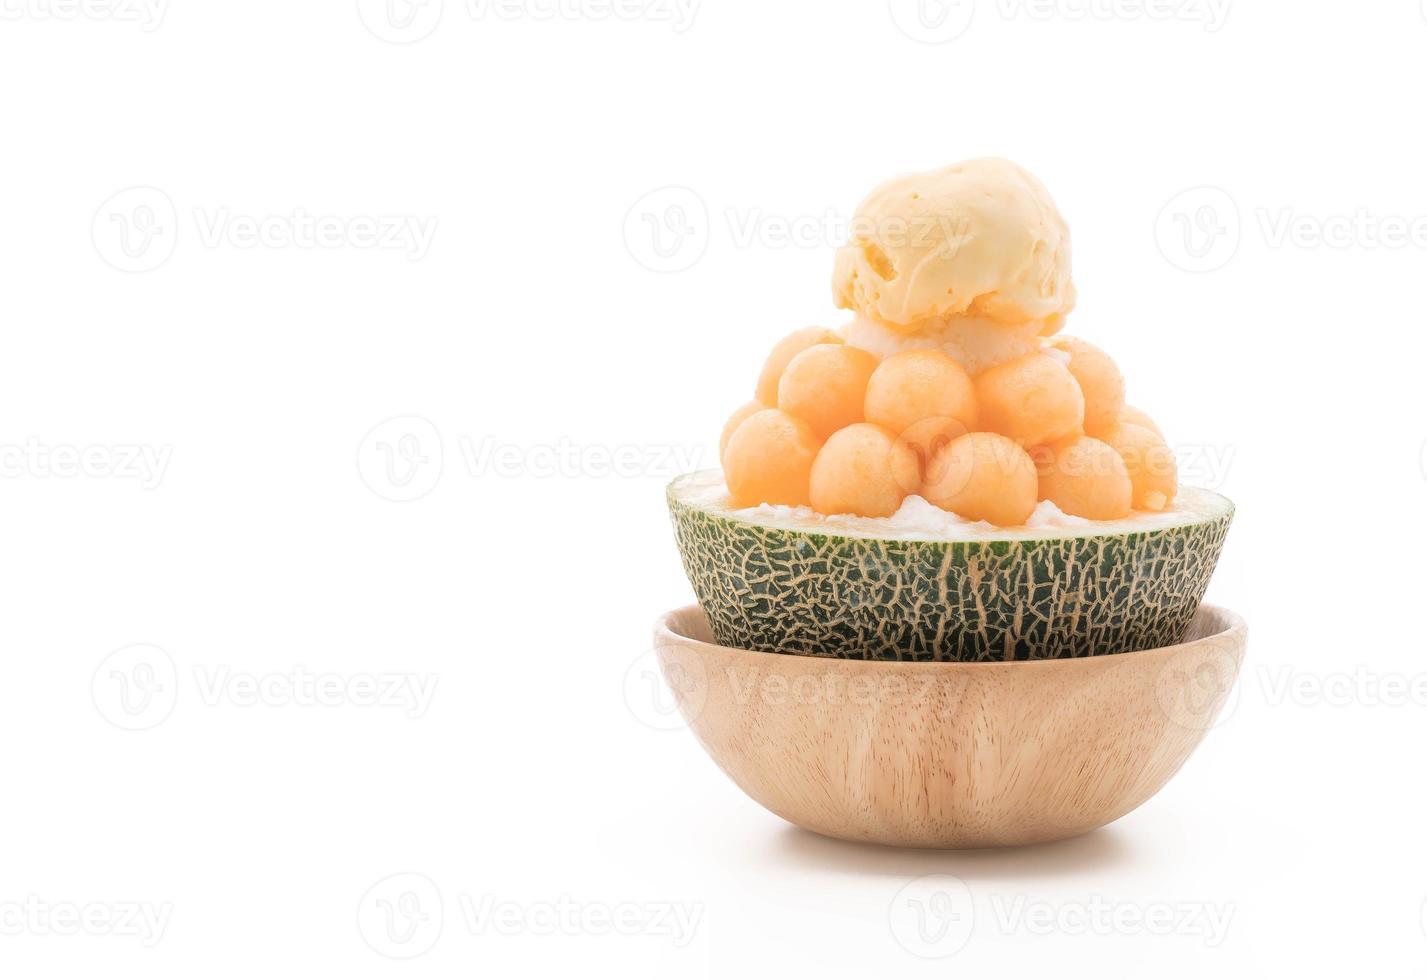 bingsu de melão de gelo, famoso sorvete coreano foto